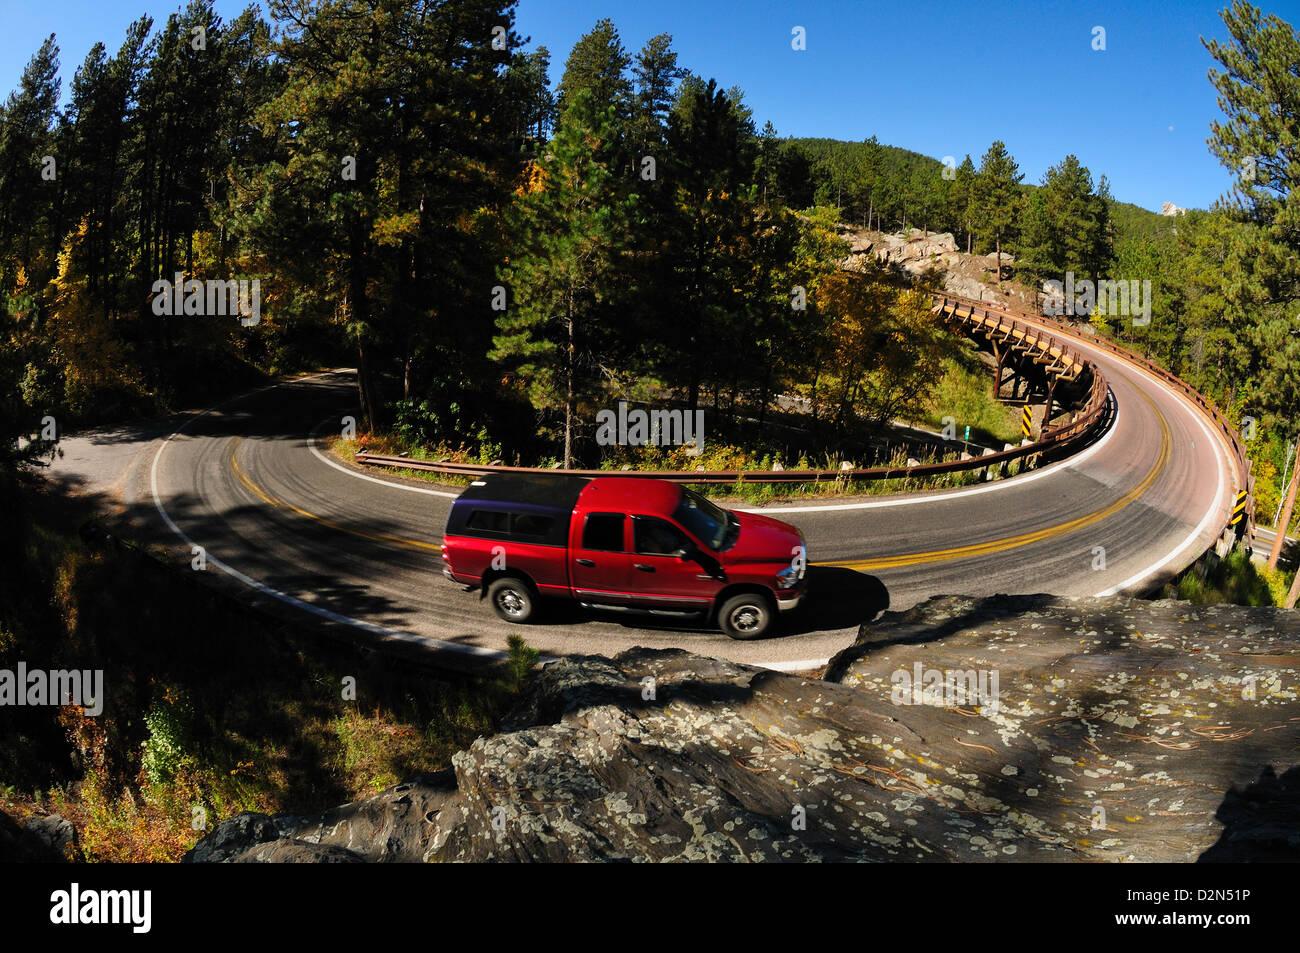 Car on the turn, Mount Rushmore, South Dakota, United States of America, North America - Stock Image